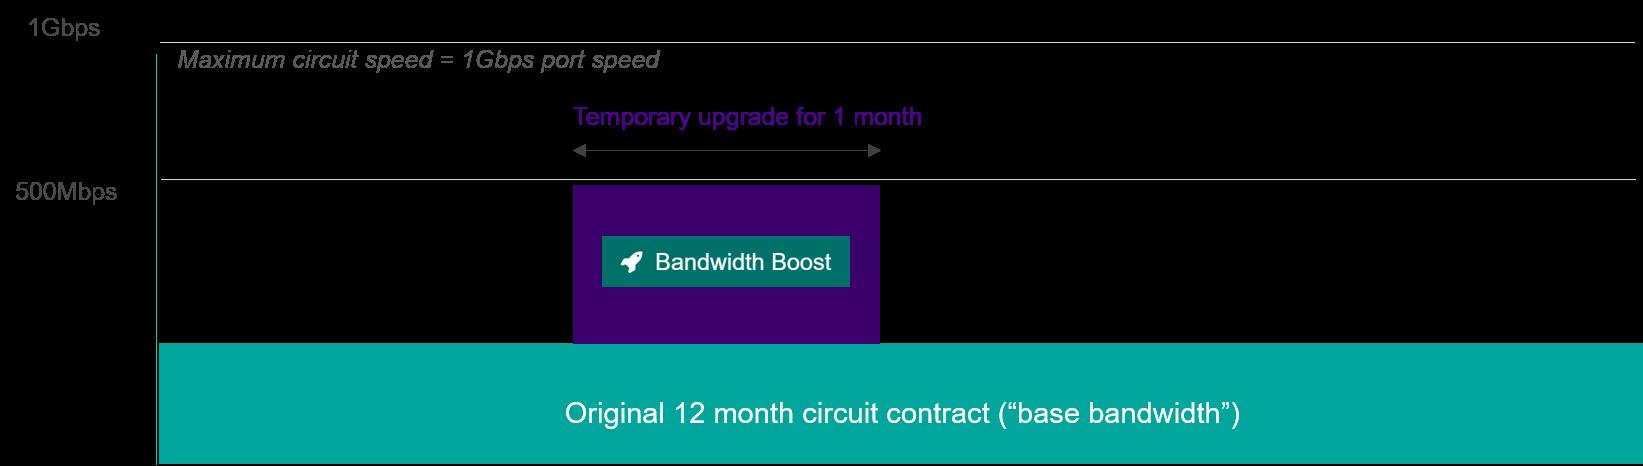 Bandwidth boost 4